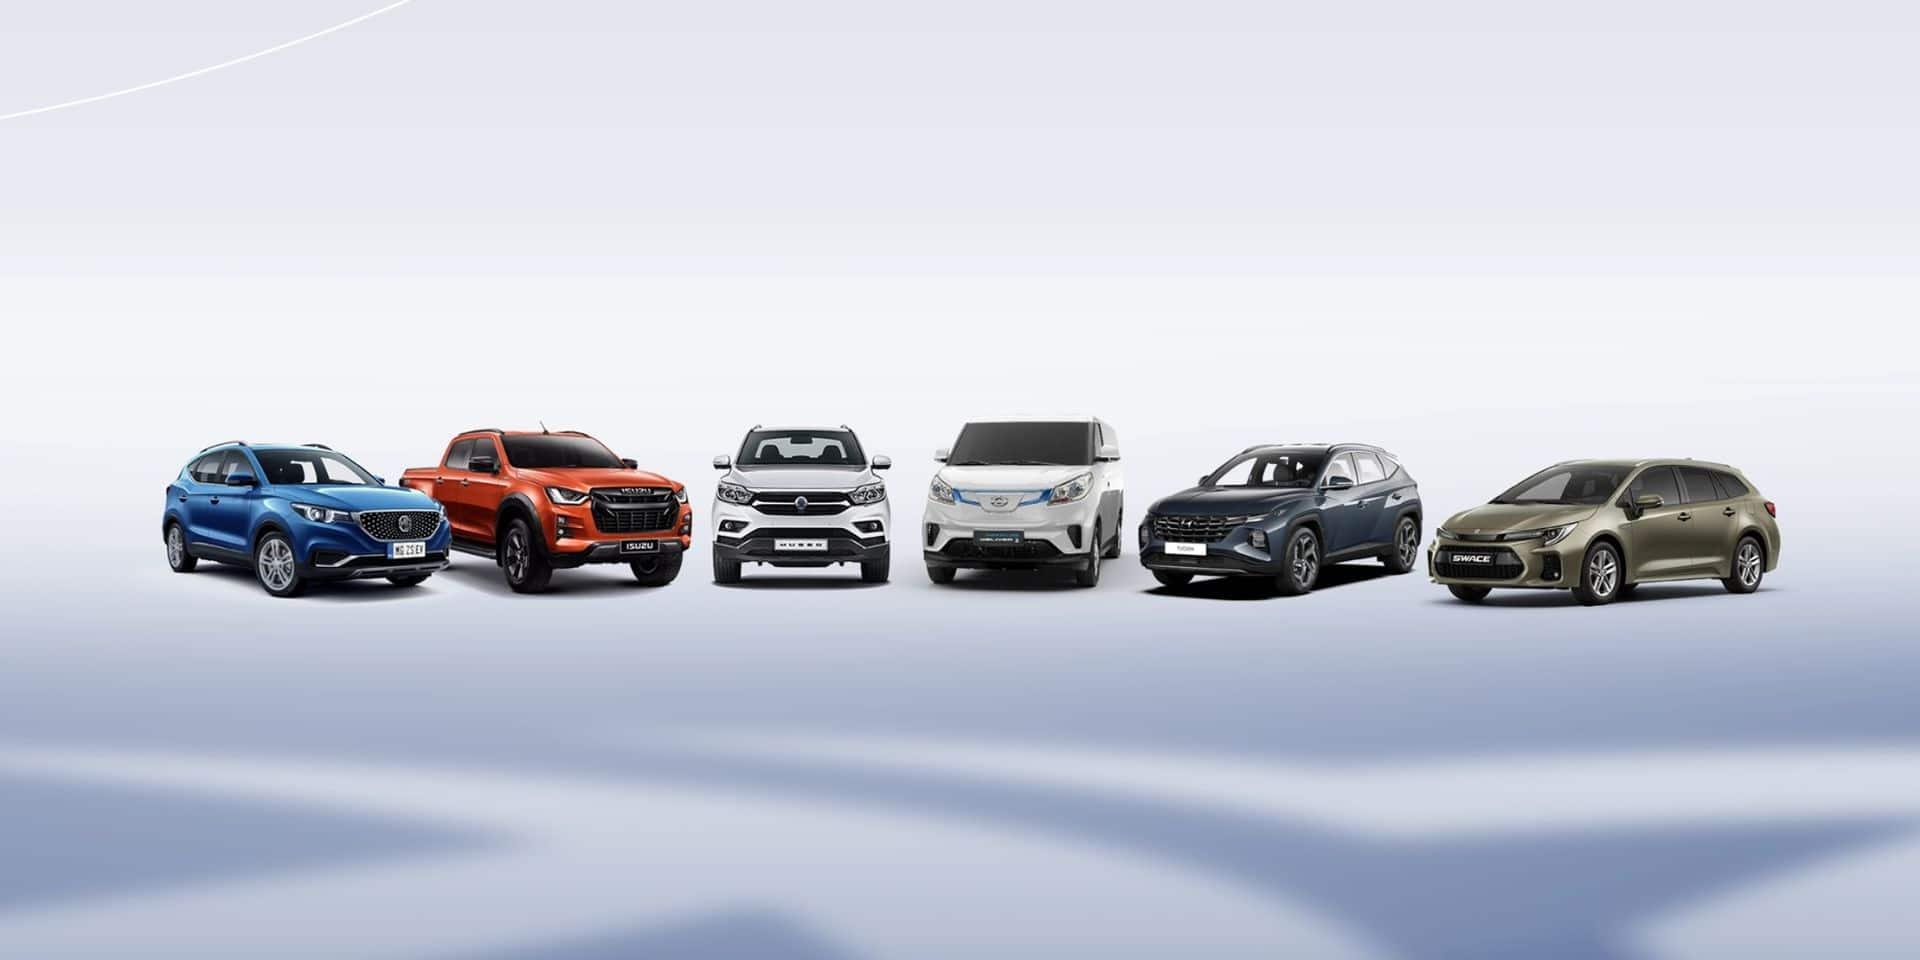 Suzuki, Hyundai et MG proposent leur propre assurance au kilomètre